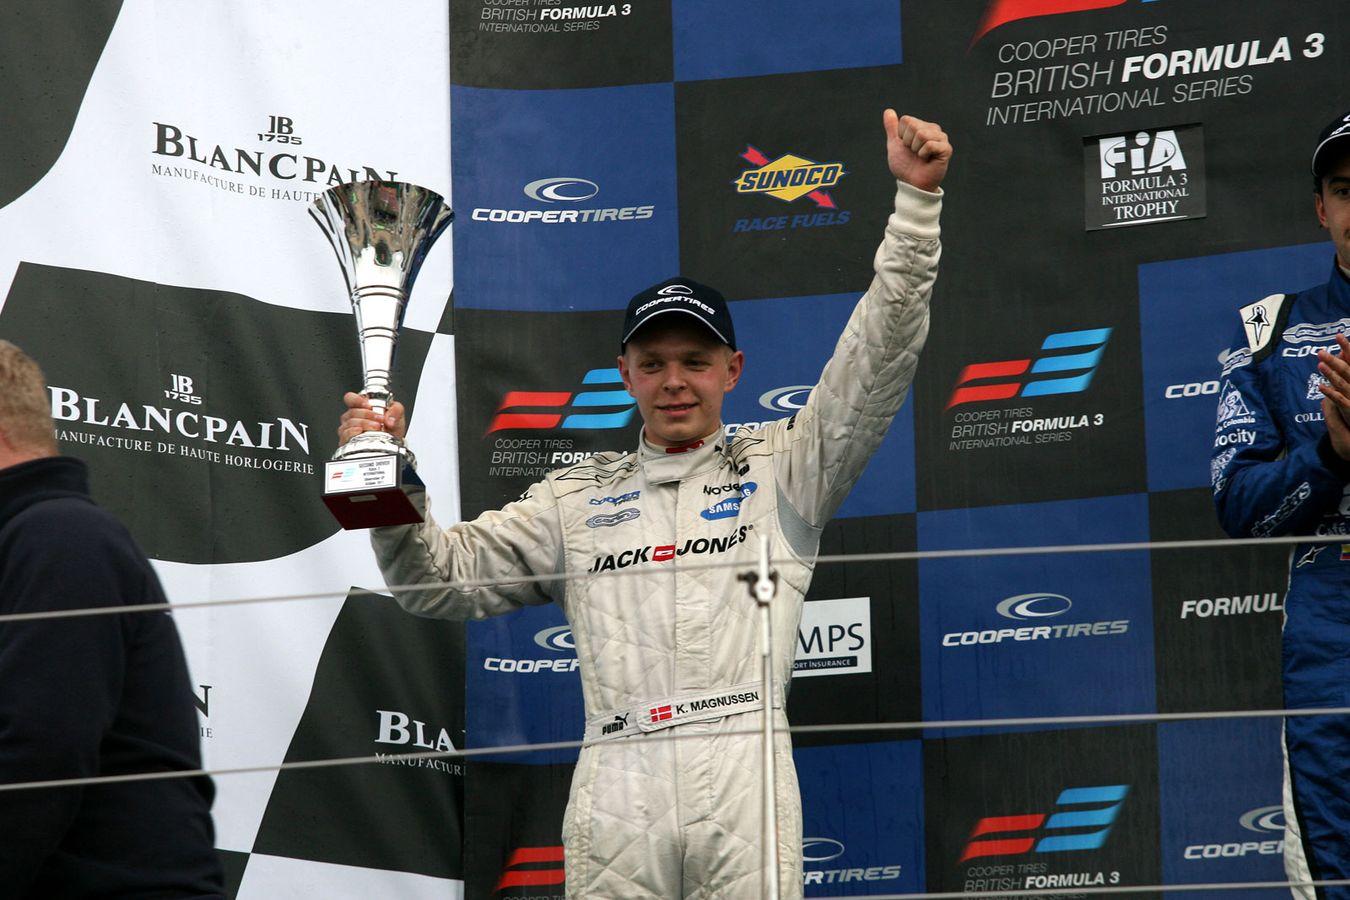 kevin-magnussen-british-formula3-silverstone-2011